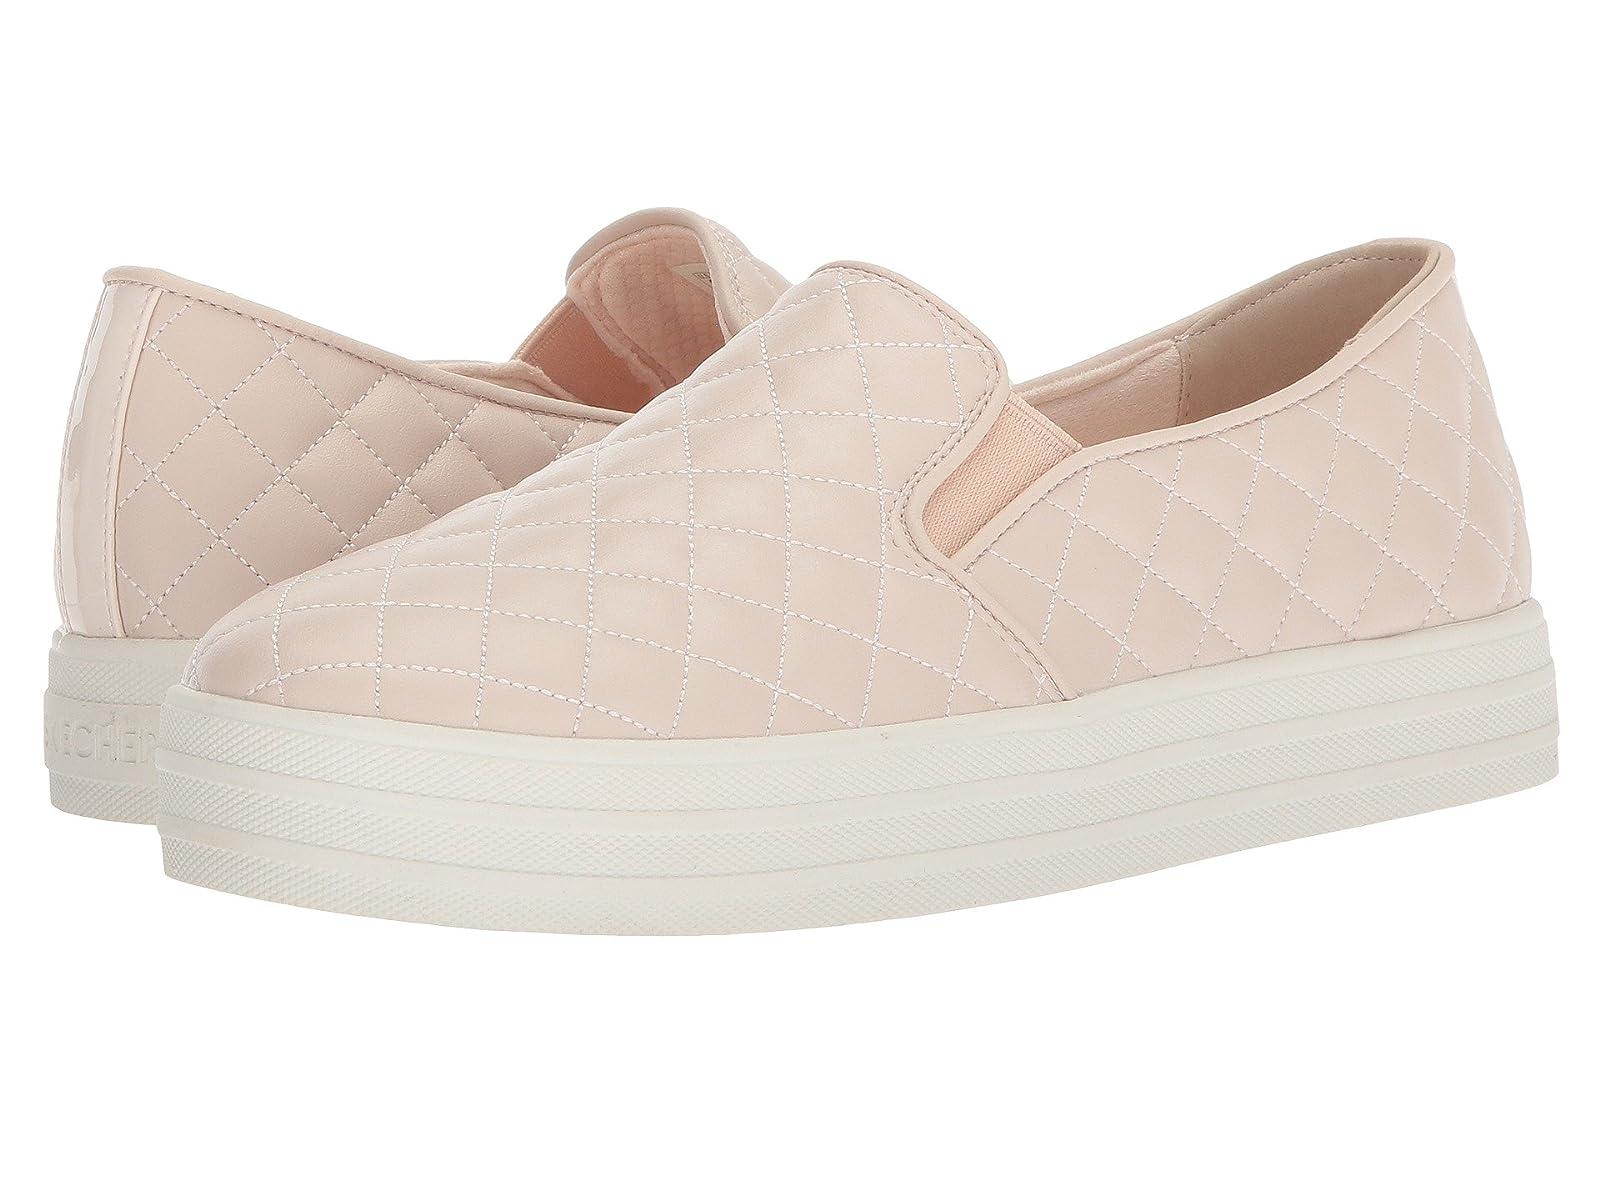 SKECHERS Double Up - DuvetAtmospheric grades have affordable shoes